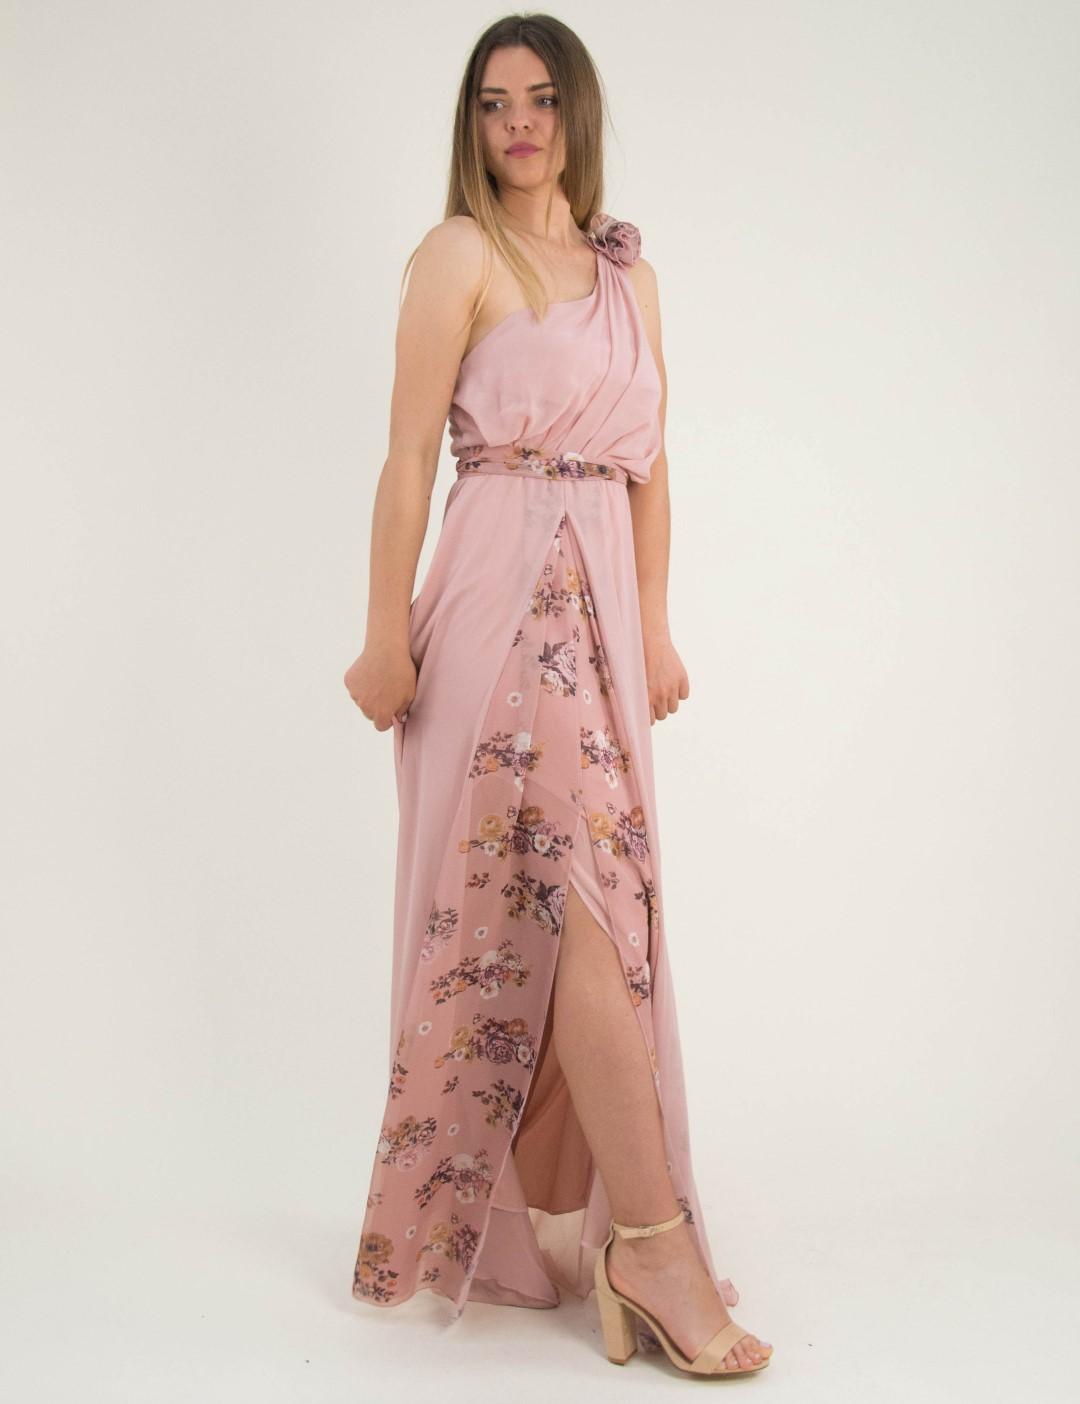 694f0fcfdba1 Γυναικείο νουντ maxi φόρεμα φλοράλ ένας ώμος No Stress 8587317L